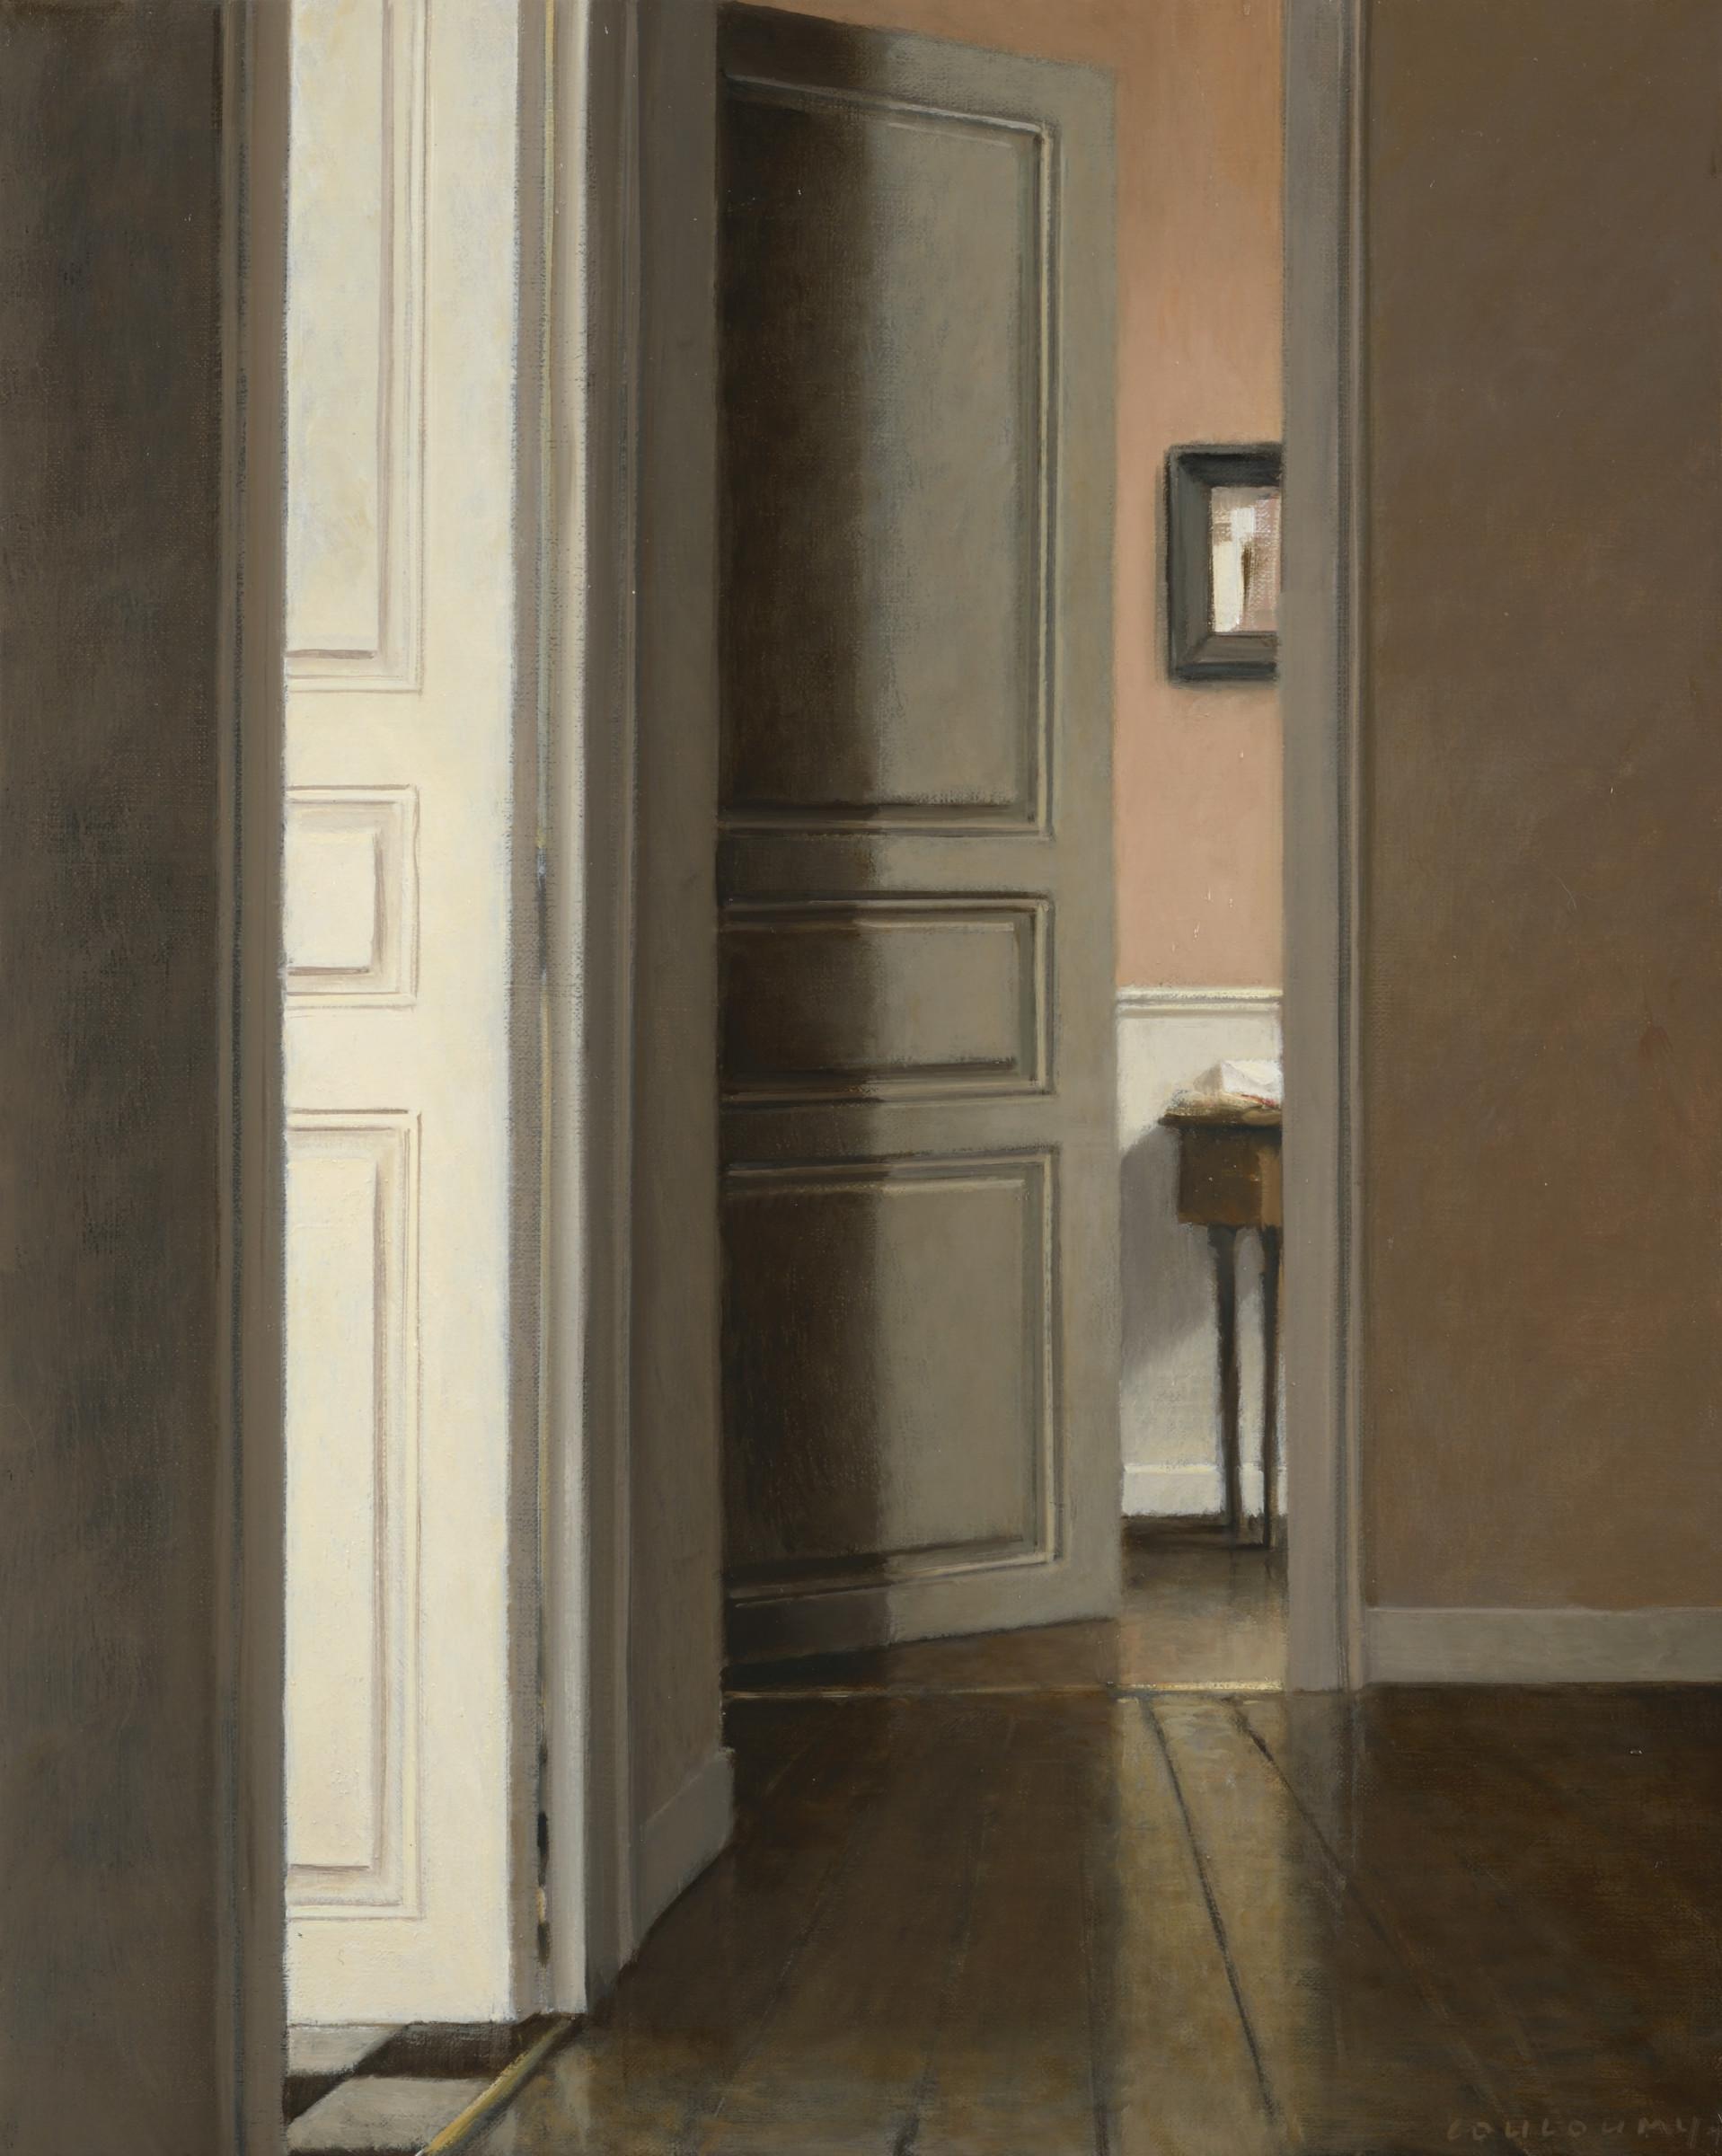 "<span class=""link fancybox-details-link""><a href=""/exhibitions/14/works/artworks2009/"">View Detail Page</a></span><div class=""artist""><strong>Anne–Françoise Couloumy</strong></div><div class=""title""><em>Le couloir rue Renan 4</em>, 2017</div><div class=""medium"">Oil on Canvas</div><div class=""dimensions"">41 x 33 cm<br>16 1/8 x 13 in.</div>"